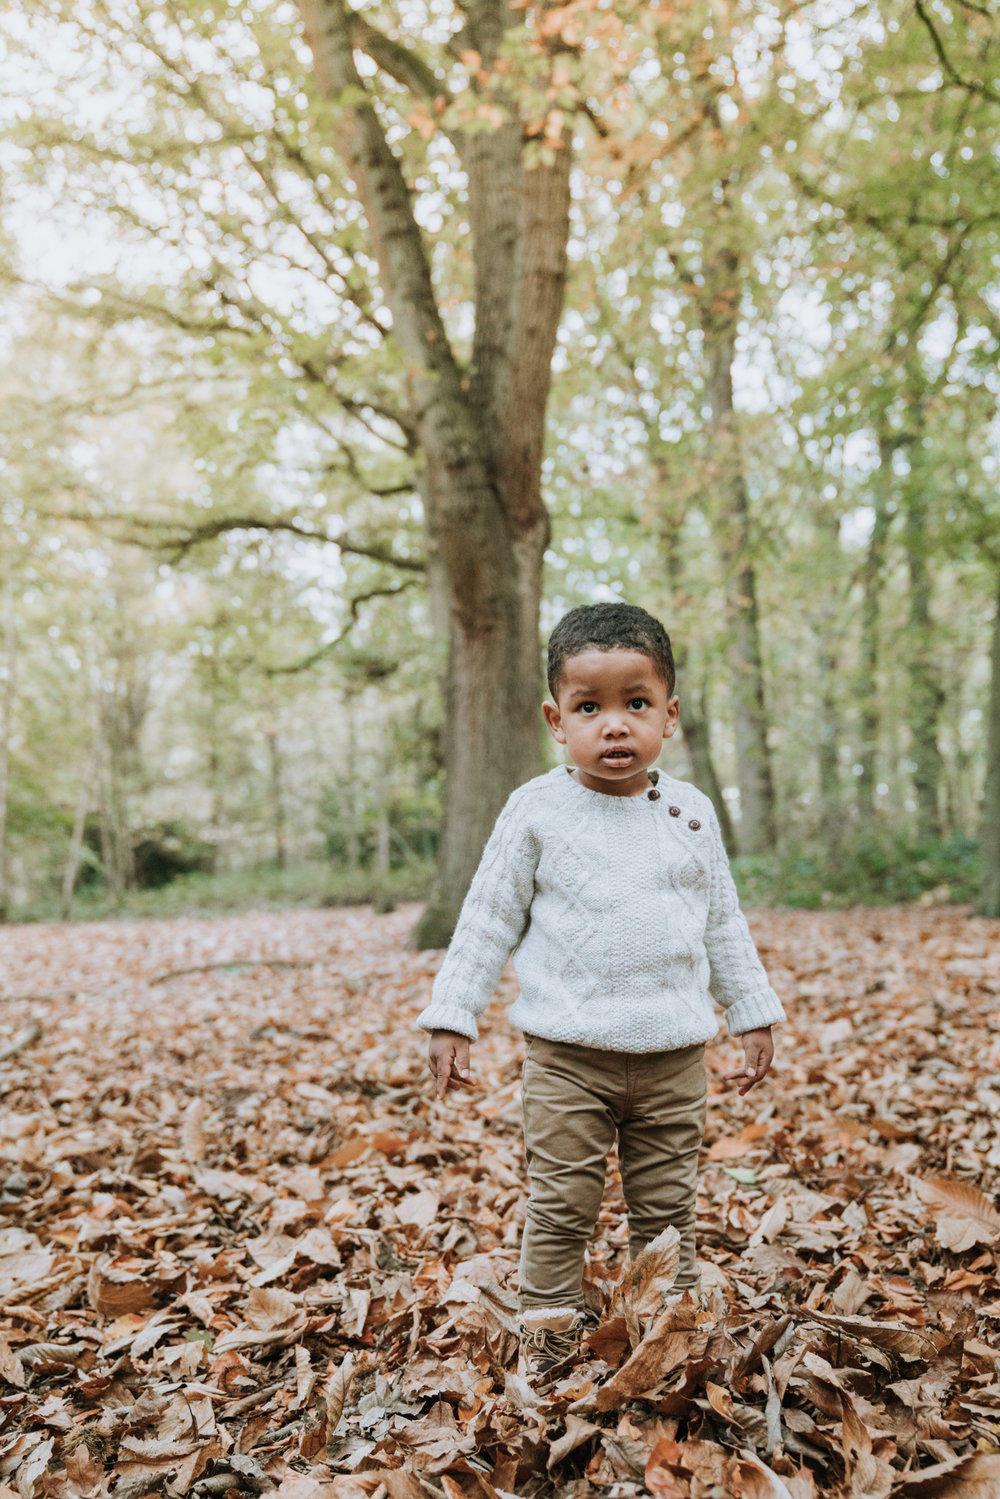 Grace-Elizabeth-Woodland-Family-Photography-Lifestyle-Essex-Norfolk-Suffolk-4.jpg